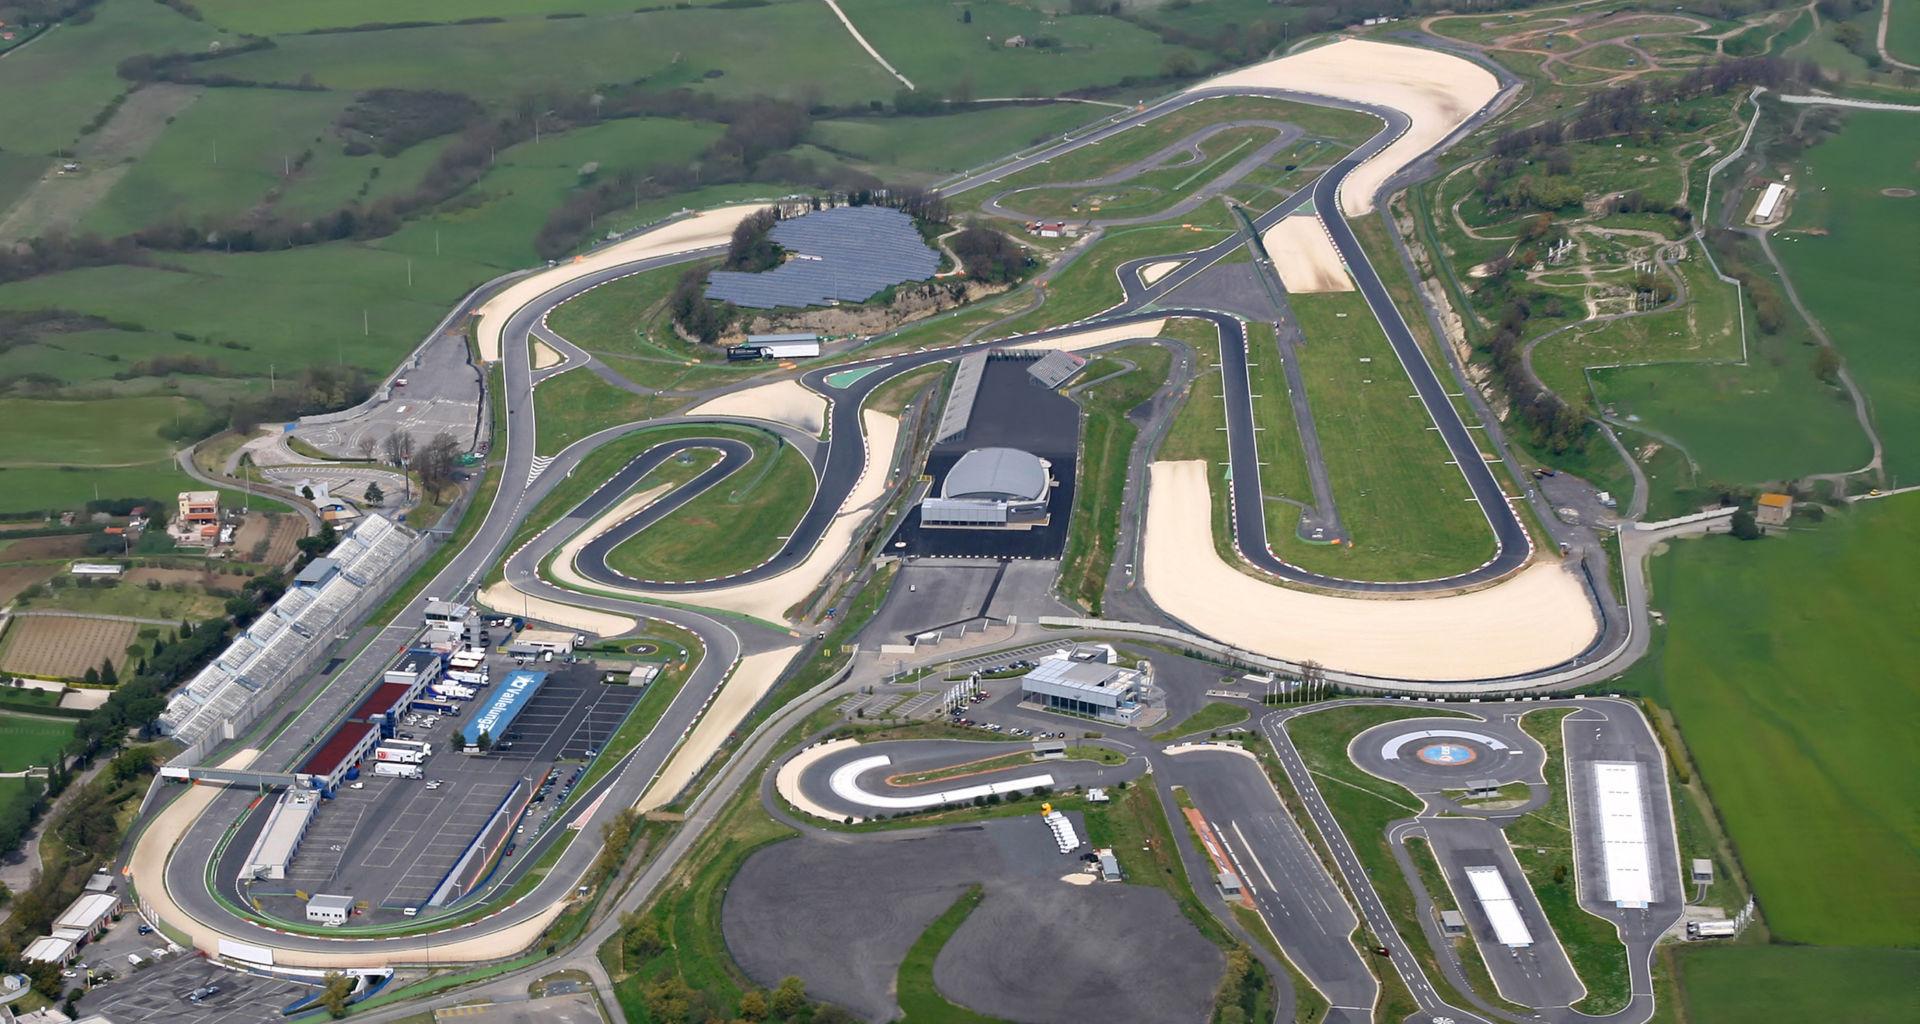 The Vallelunga Circuit, near Rome, Italy. Photo courtesy Dorna.